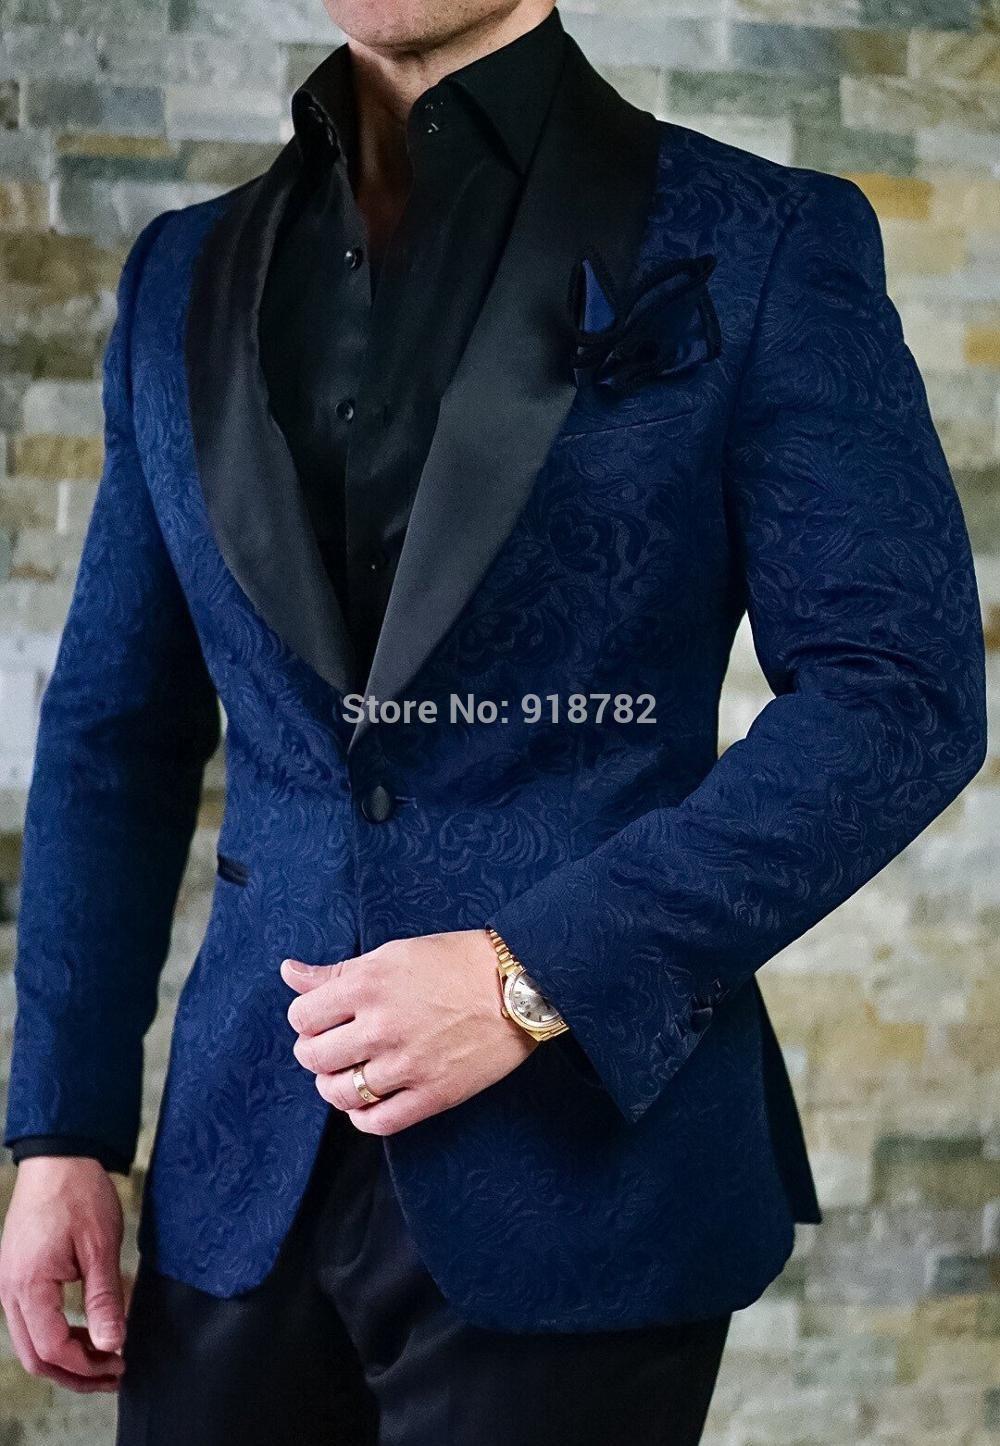 Compre Traje De Hombre Para Boda 2018 Nuevo Diseñador Por Encargo Azul  Marino Chaqueta Con Pantalón Negro Traje De Hombre Formal Prom Boda Smoking  A  137.03 ... 0a67880dd79